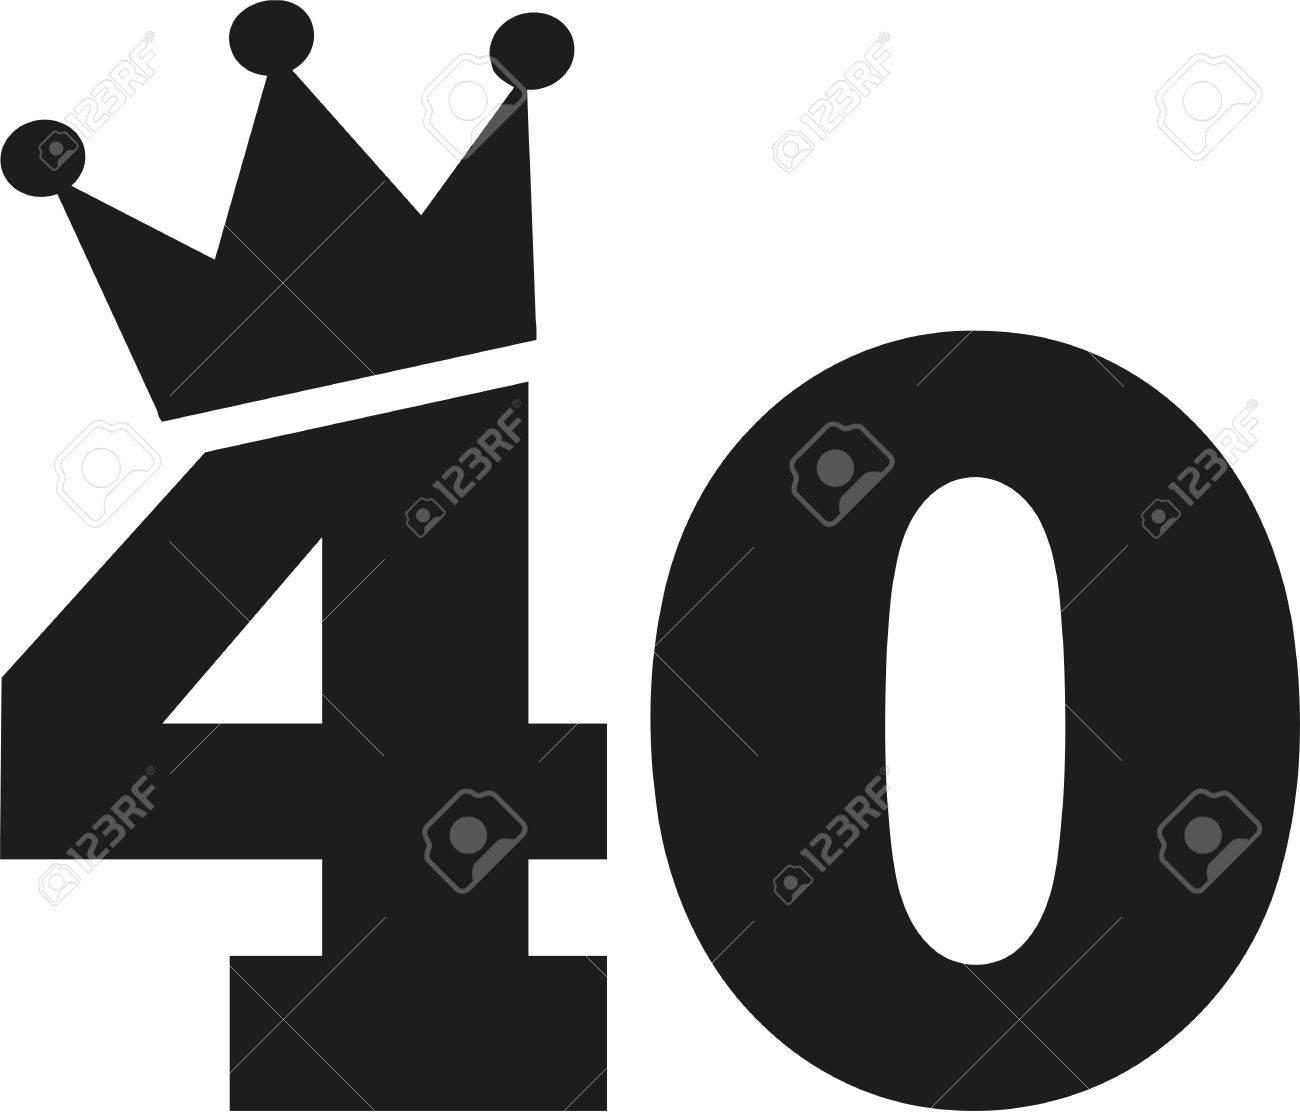 Imagenes De Cumpleanos Numero 40.Numero 40 Cumpleanos De La Corona